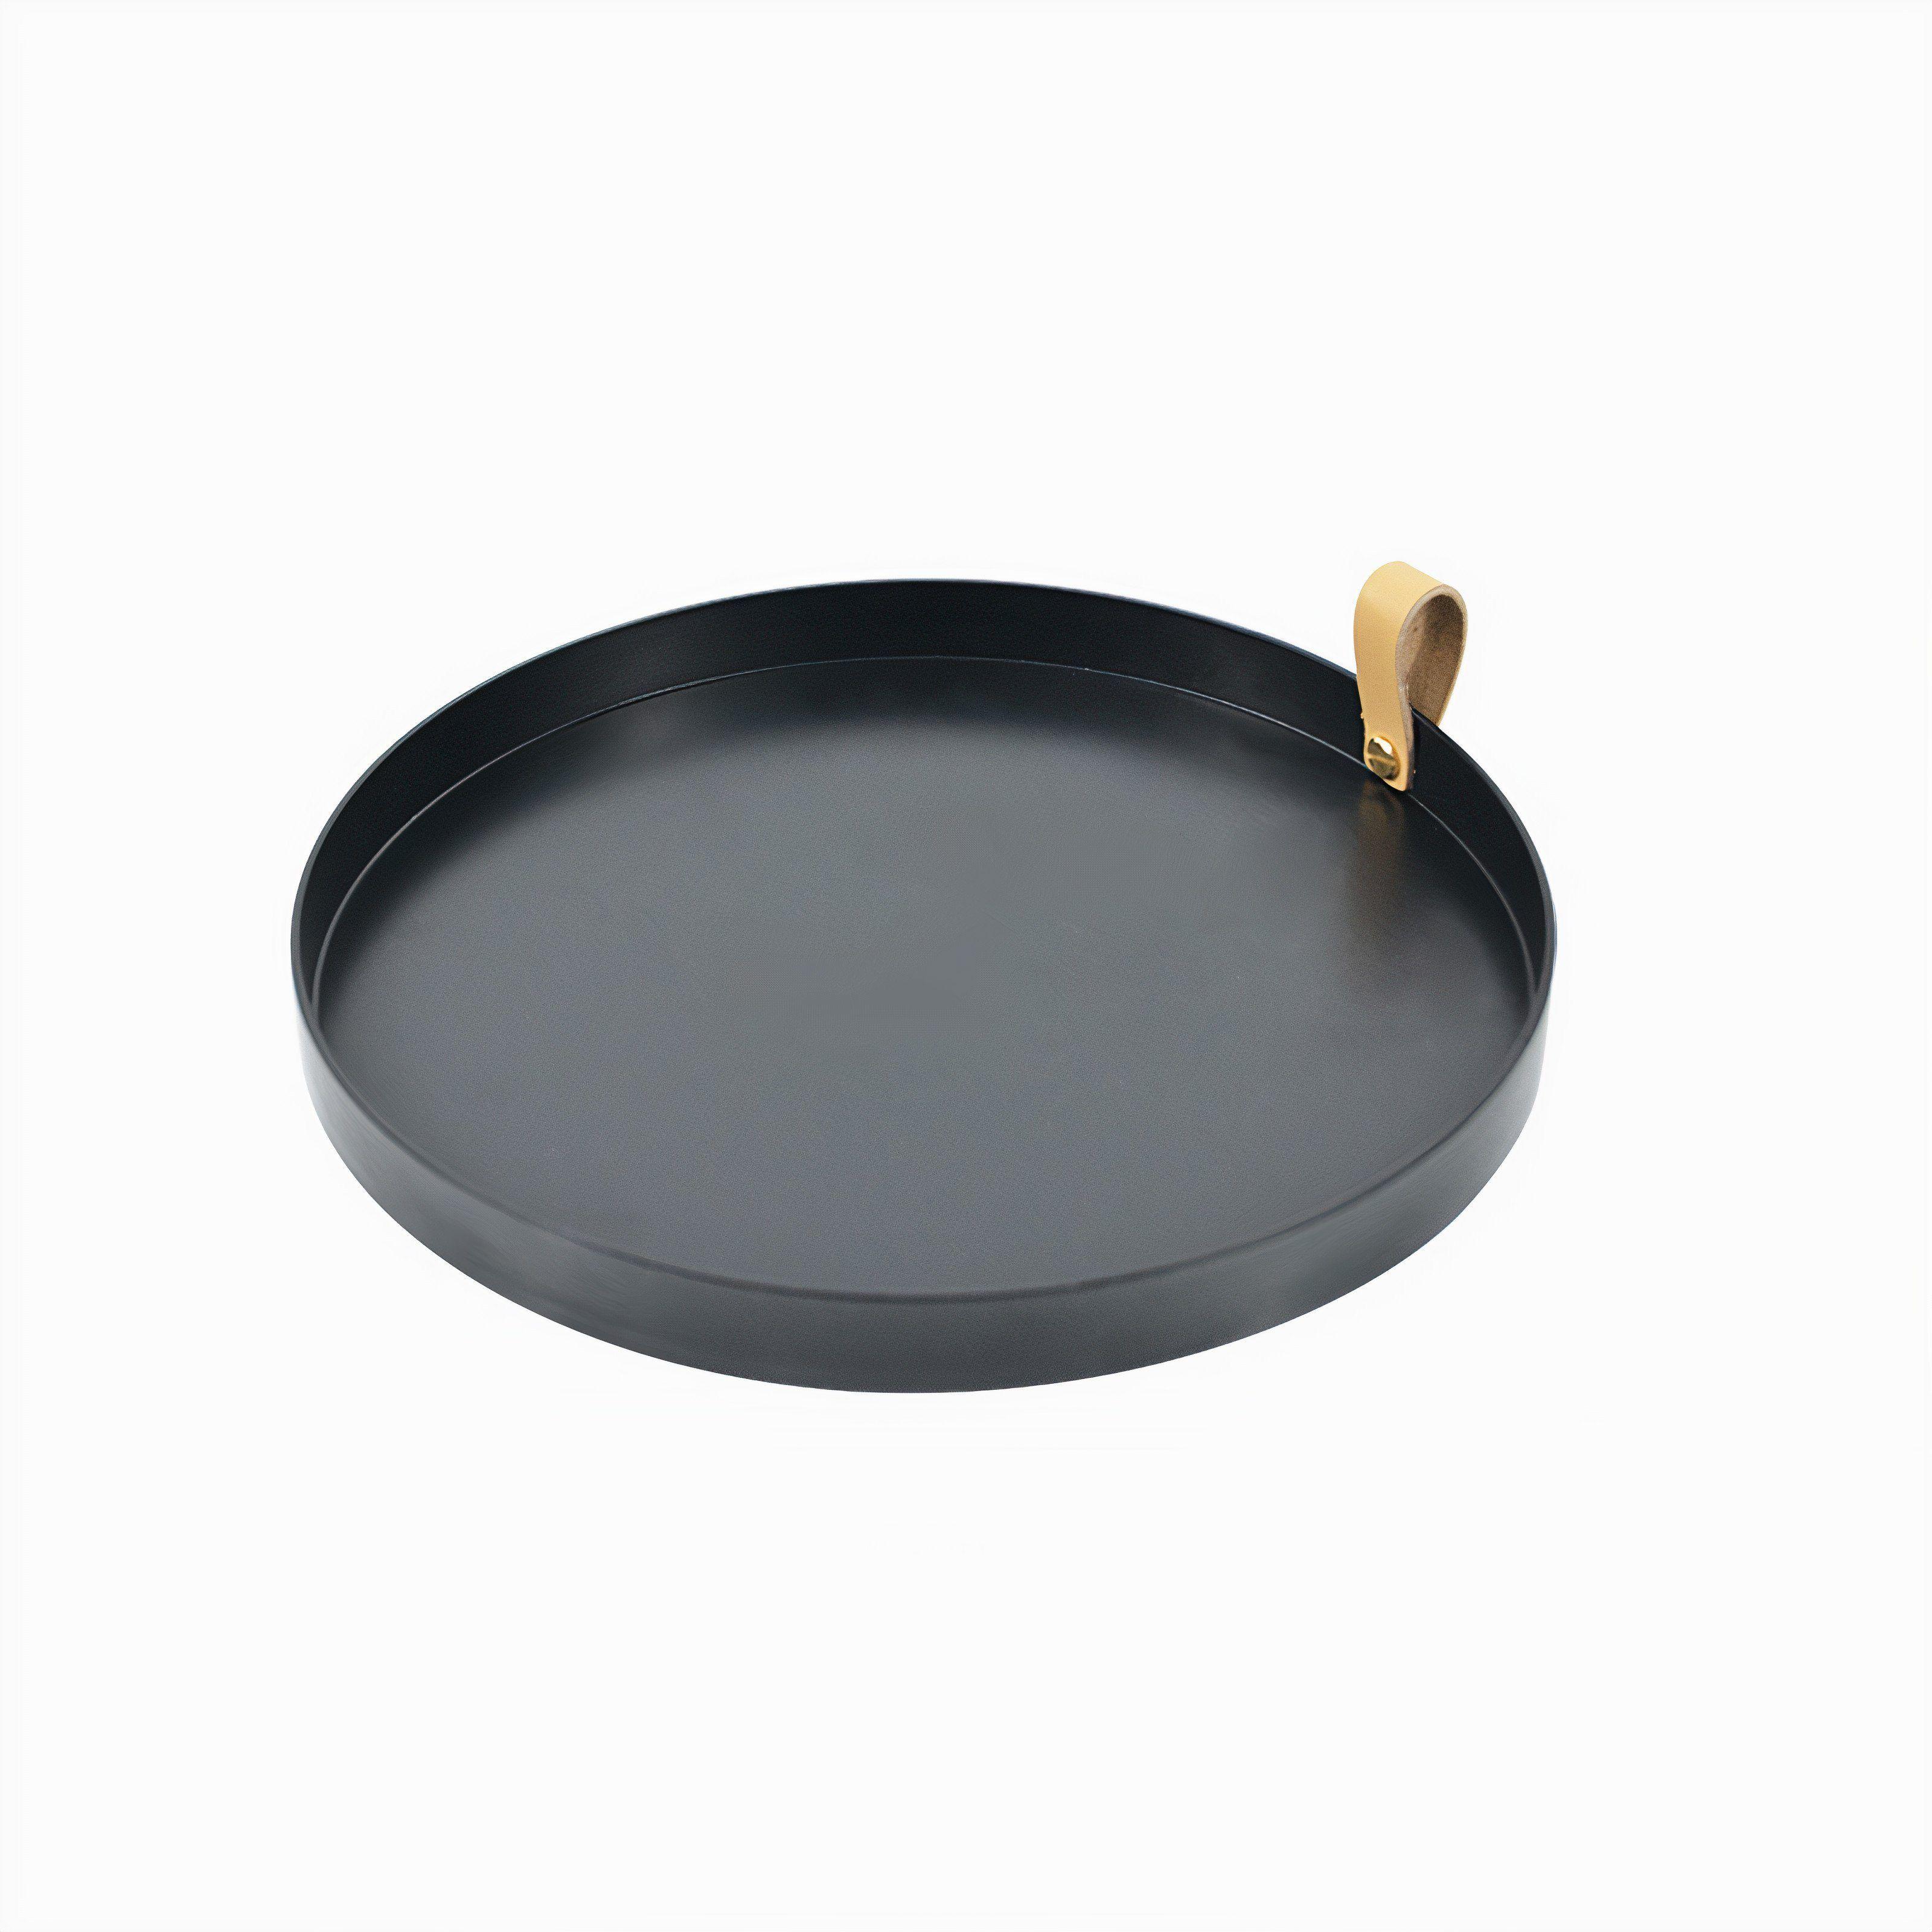 Minimalist Trinket Tray - Black